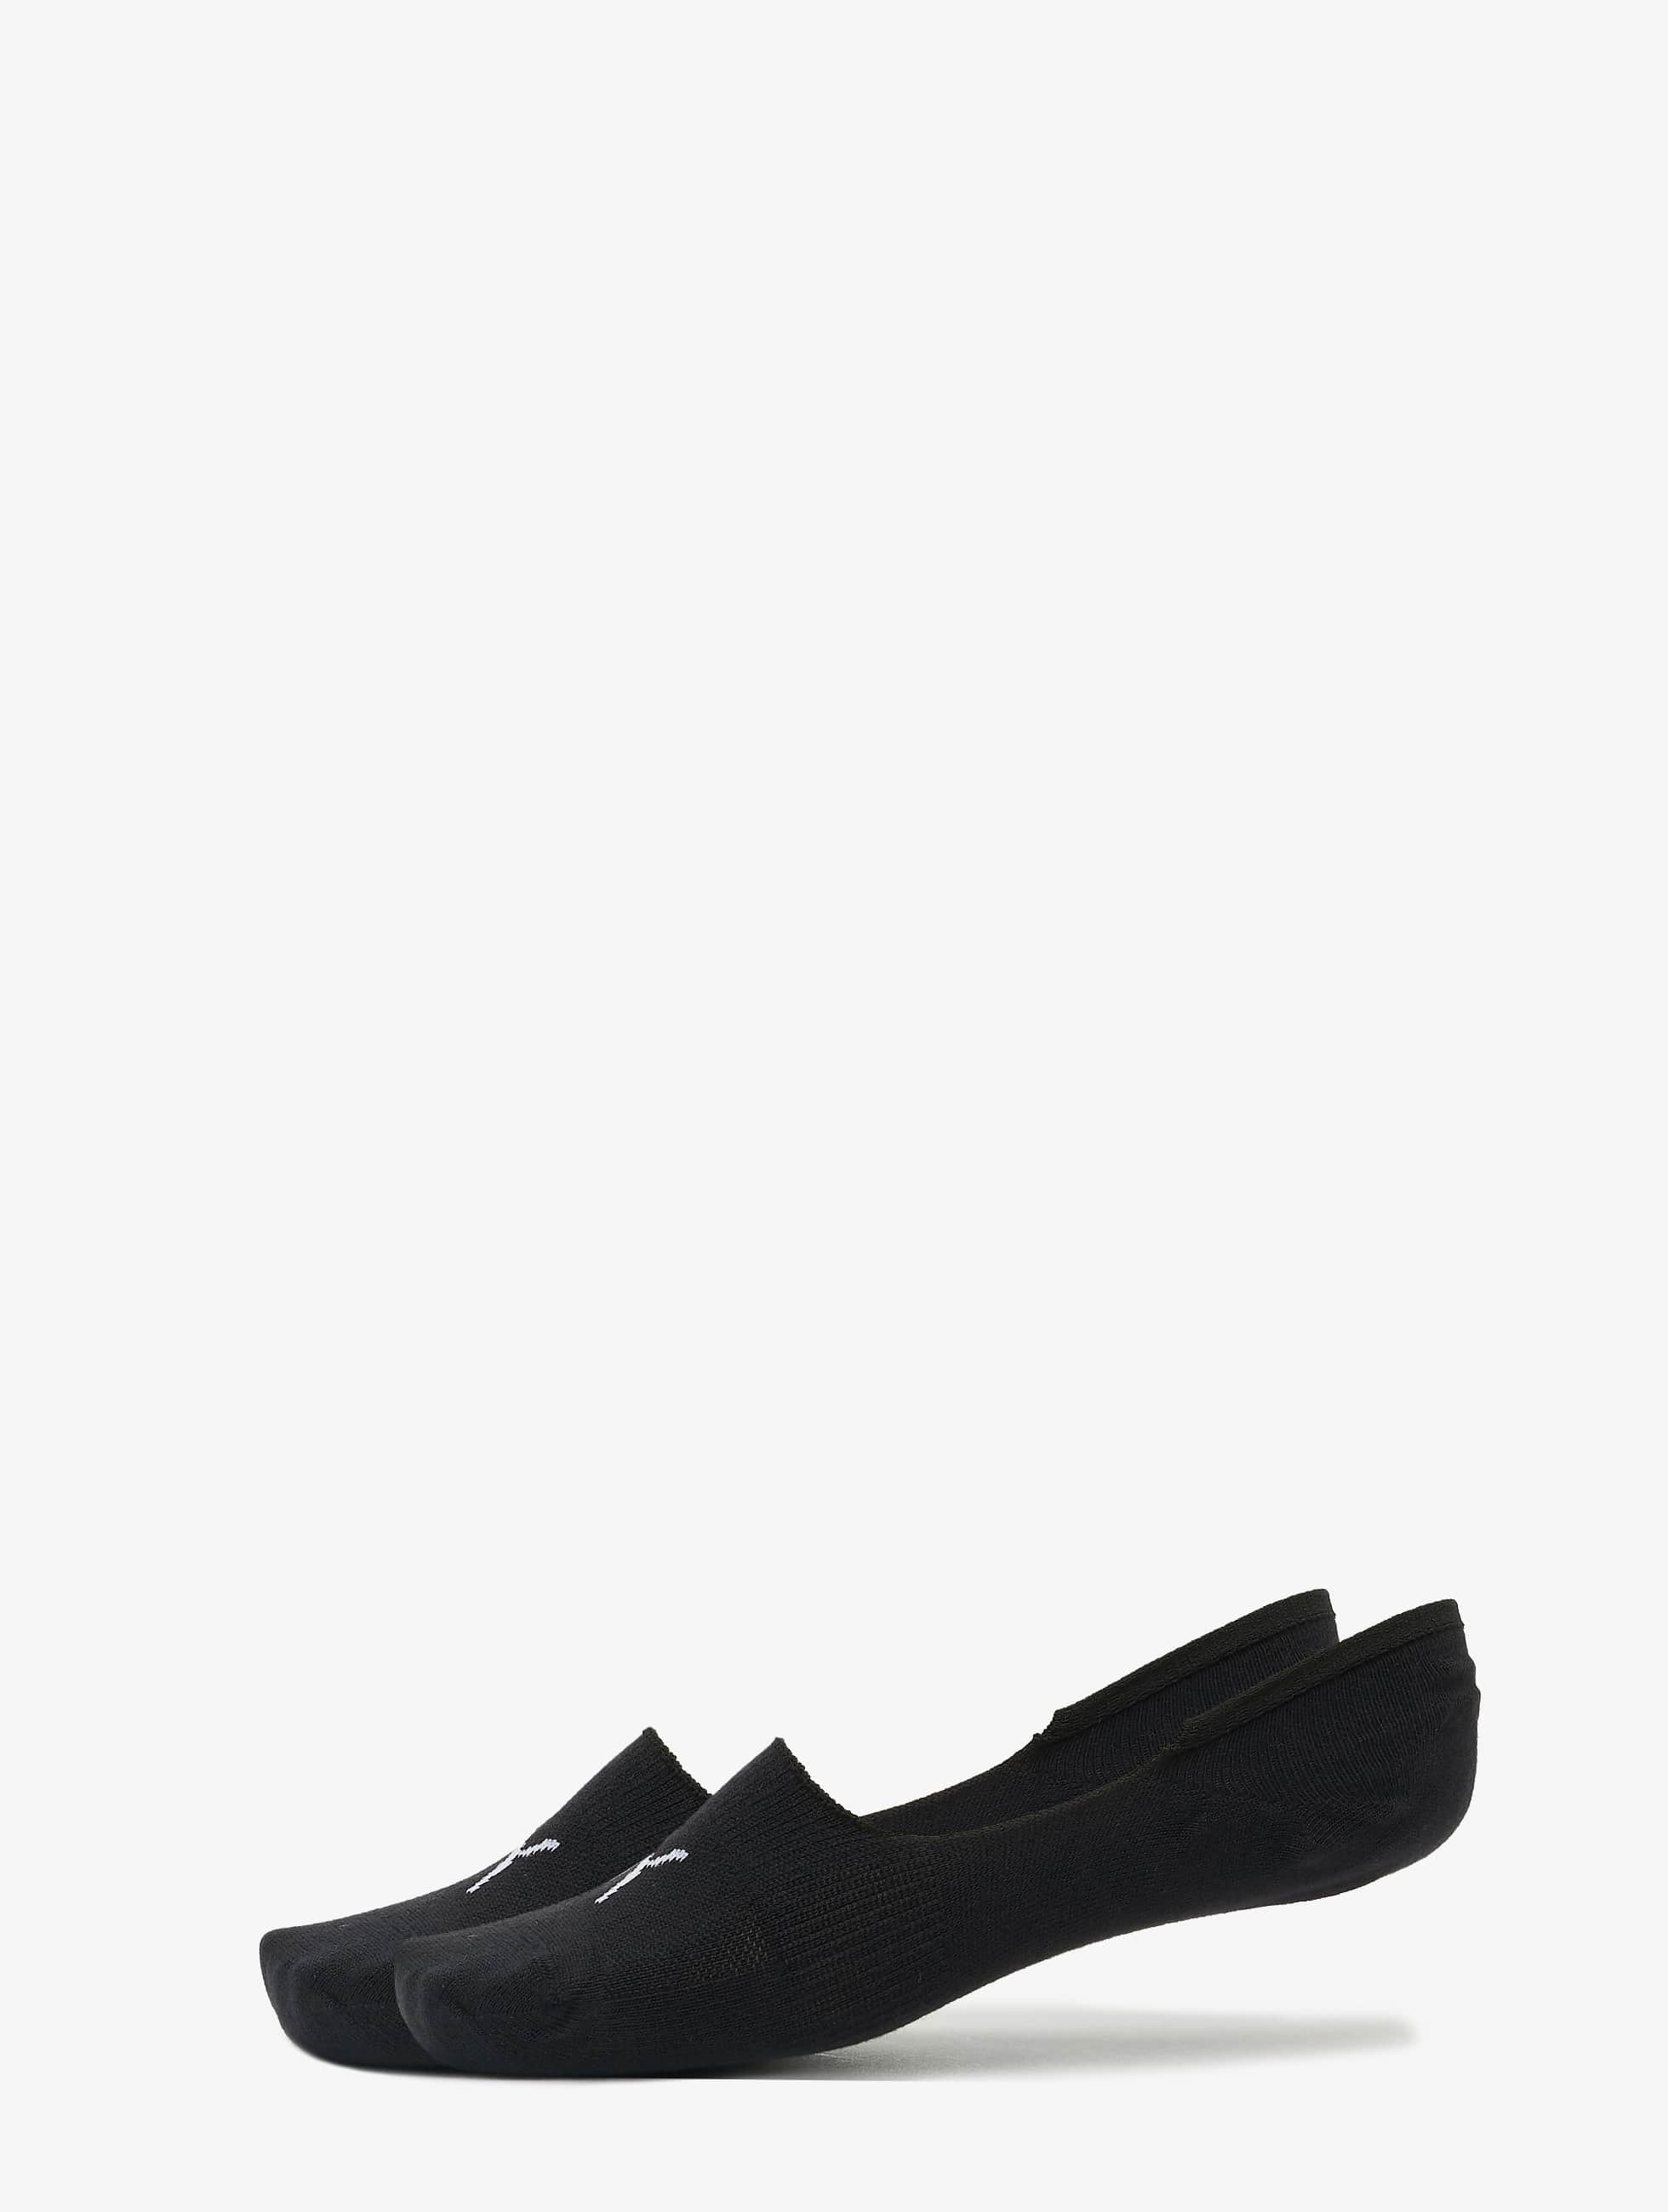 Puma Chaussettes 2-Pack Footies noir